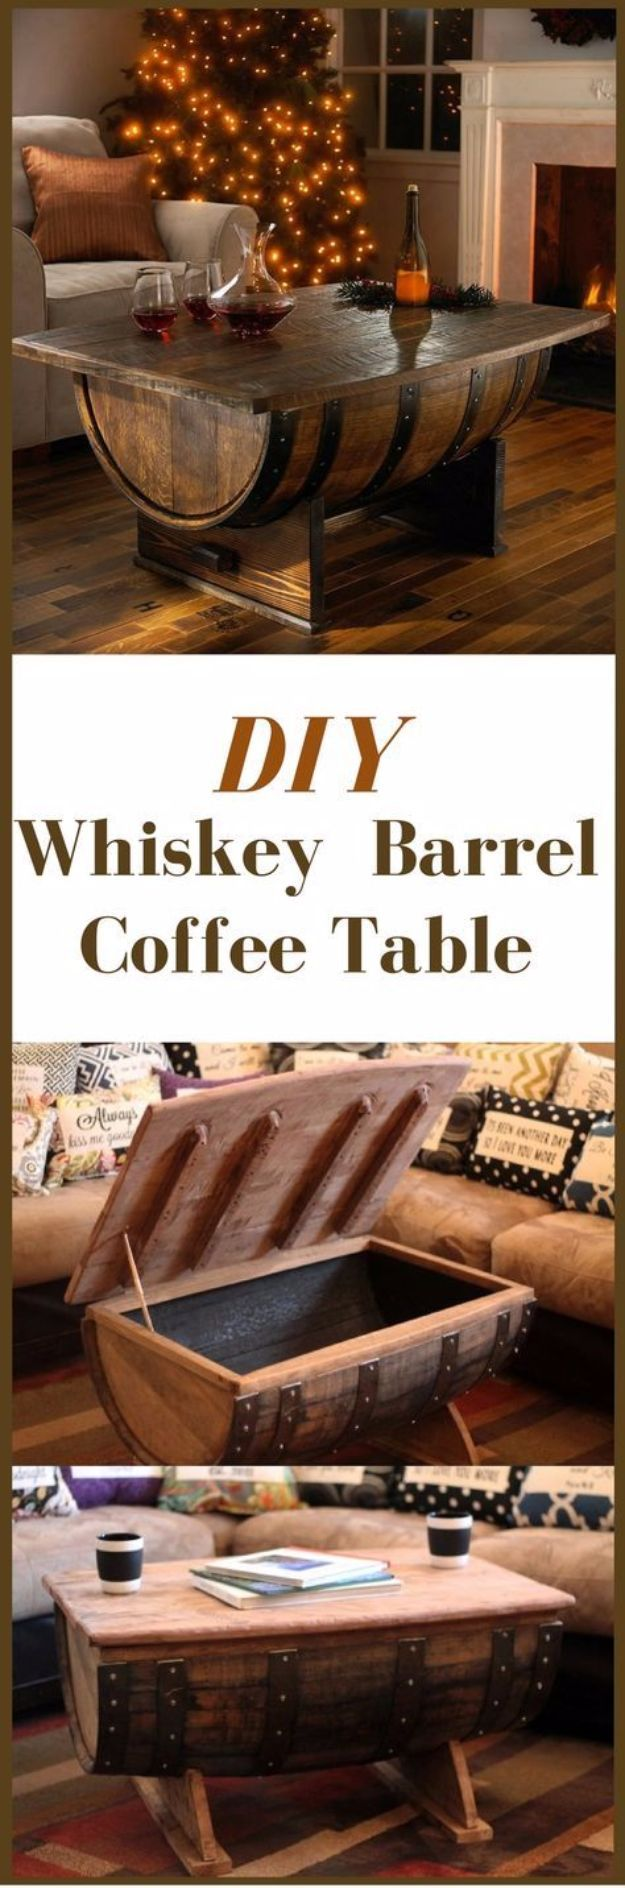 best diy mancave decor ideas whiskey barrel coffee table